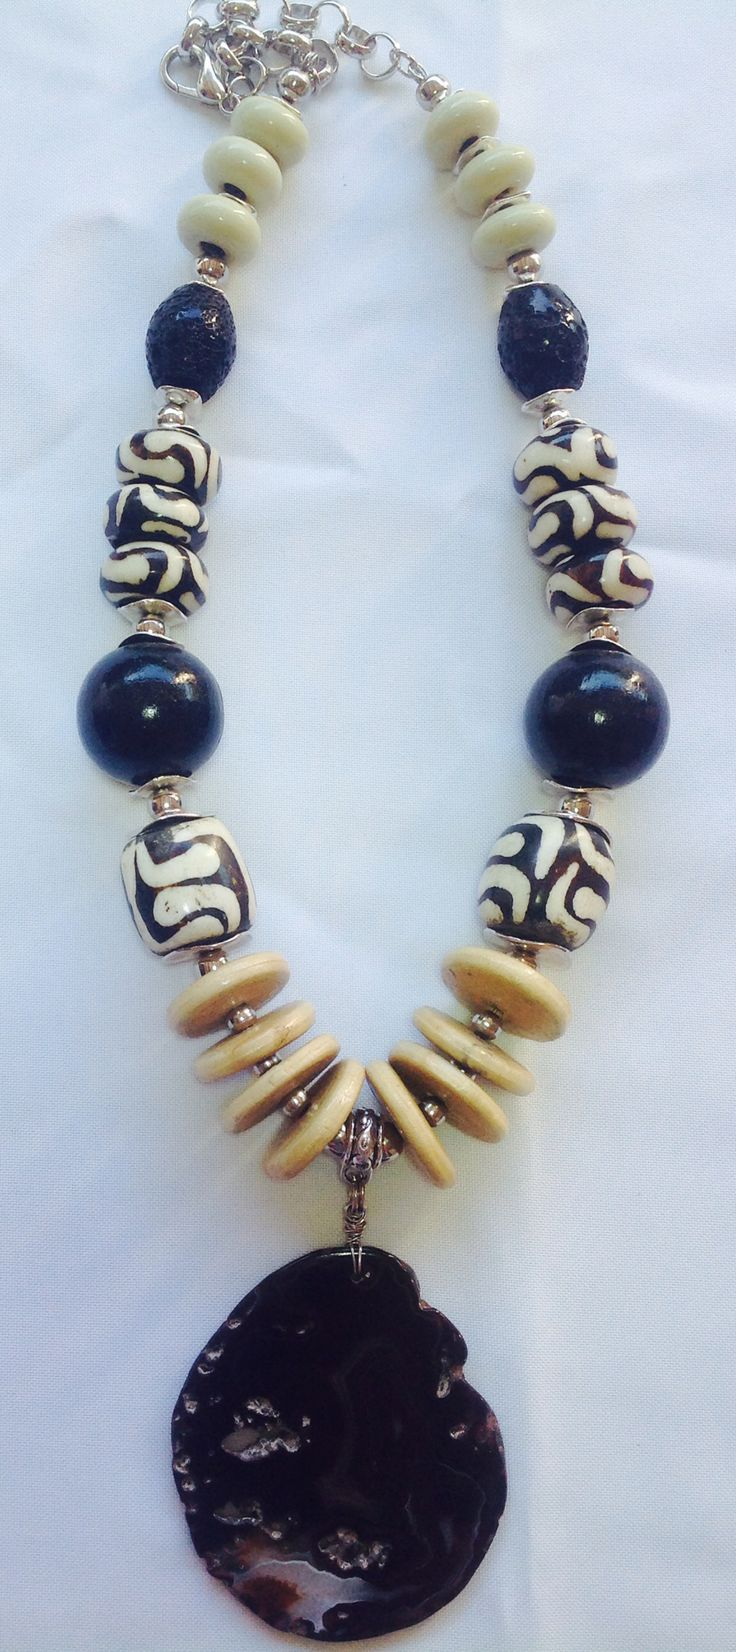 Chunky African tribal necklace, medium length: Large natural black agate pendant, wood discs, batik bone, black wood beads - Michela Rae